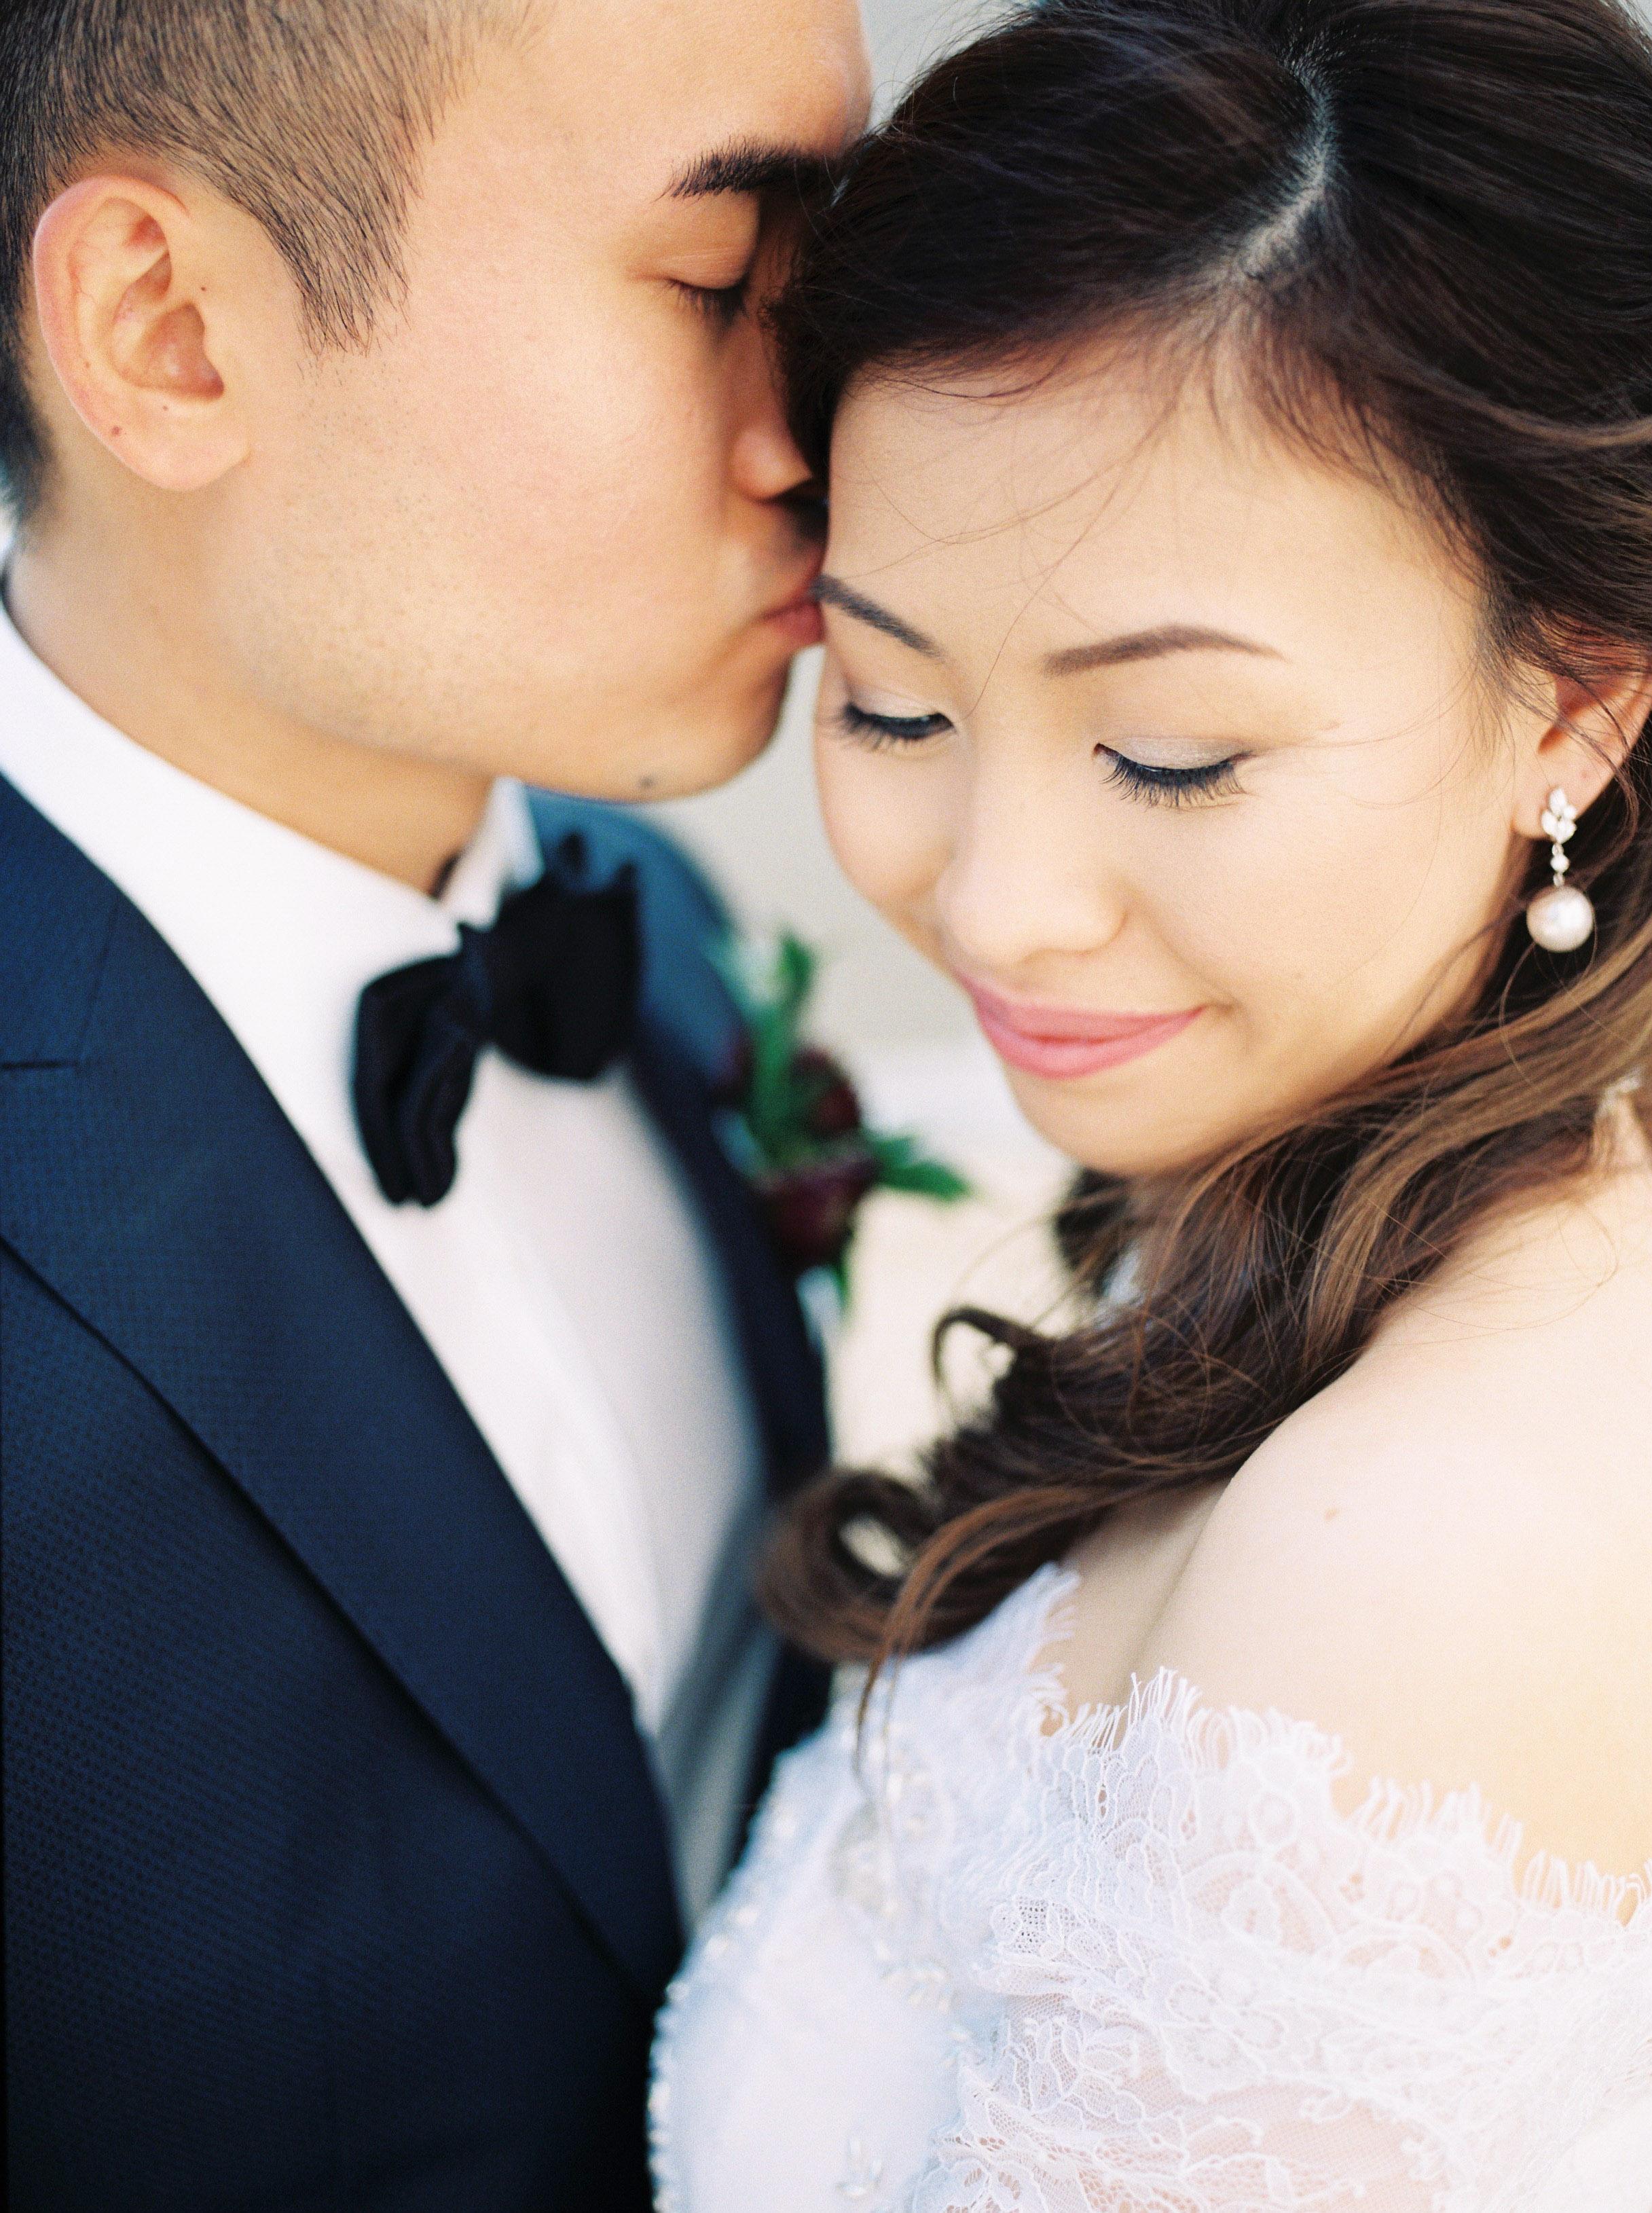 Toronto-Collingwood-Muskoka-Wedding-photographer-ideal-wedding-day-photography-timeline7.jpg